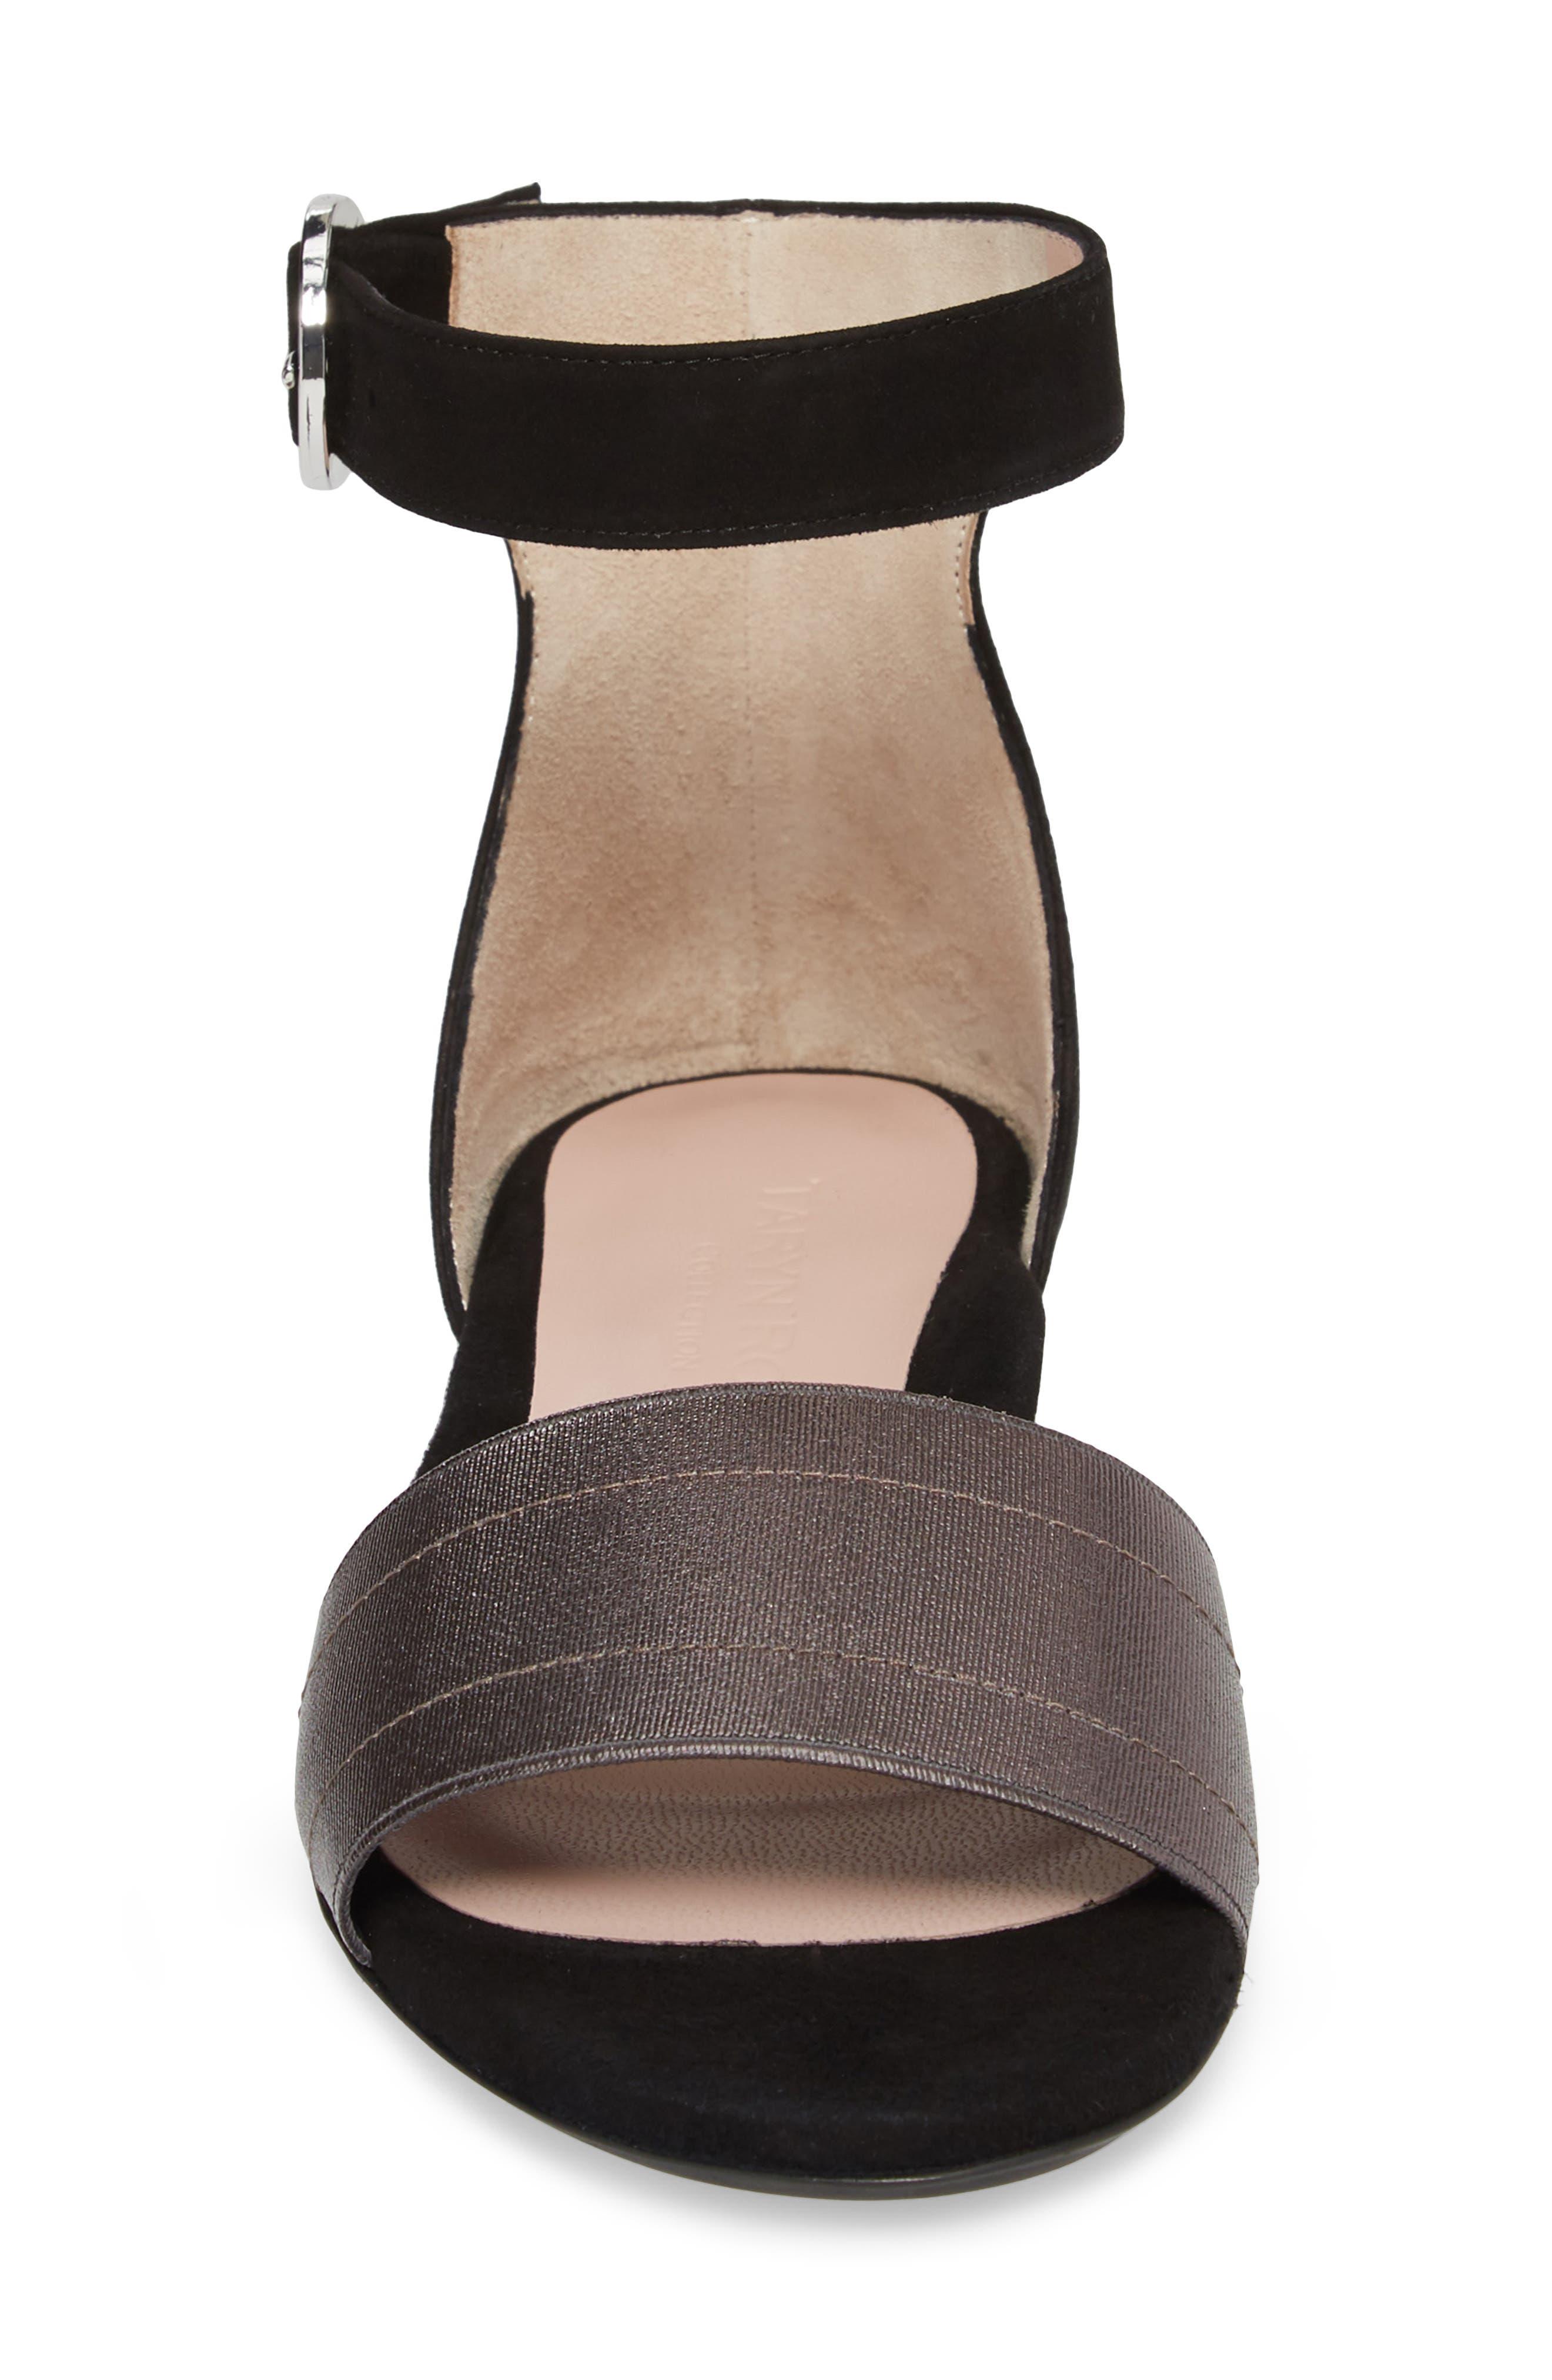 Donati Ankle Strap Sandal,                             Alternate thumbnail 4, color,                             Black/ Gunmetal Suede